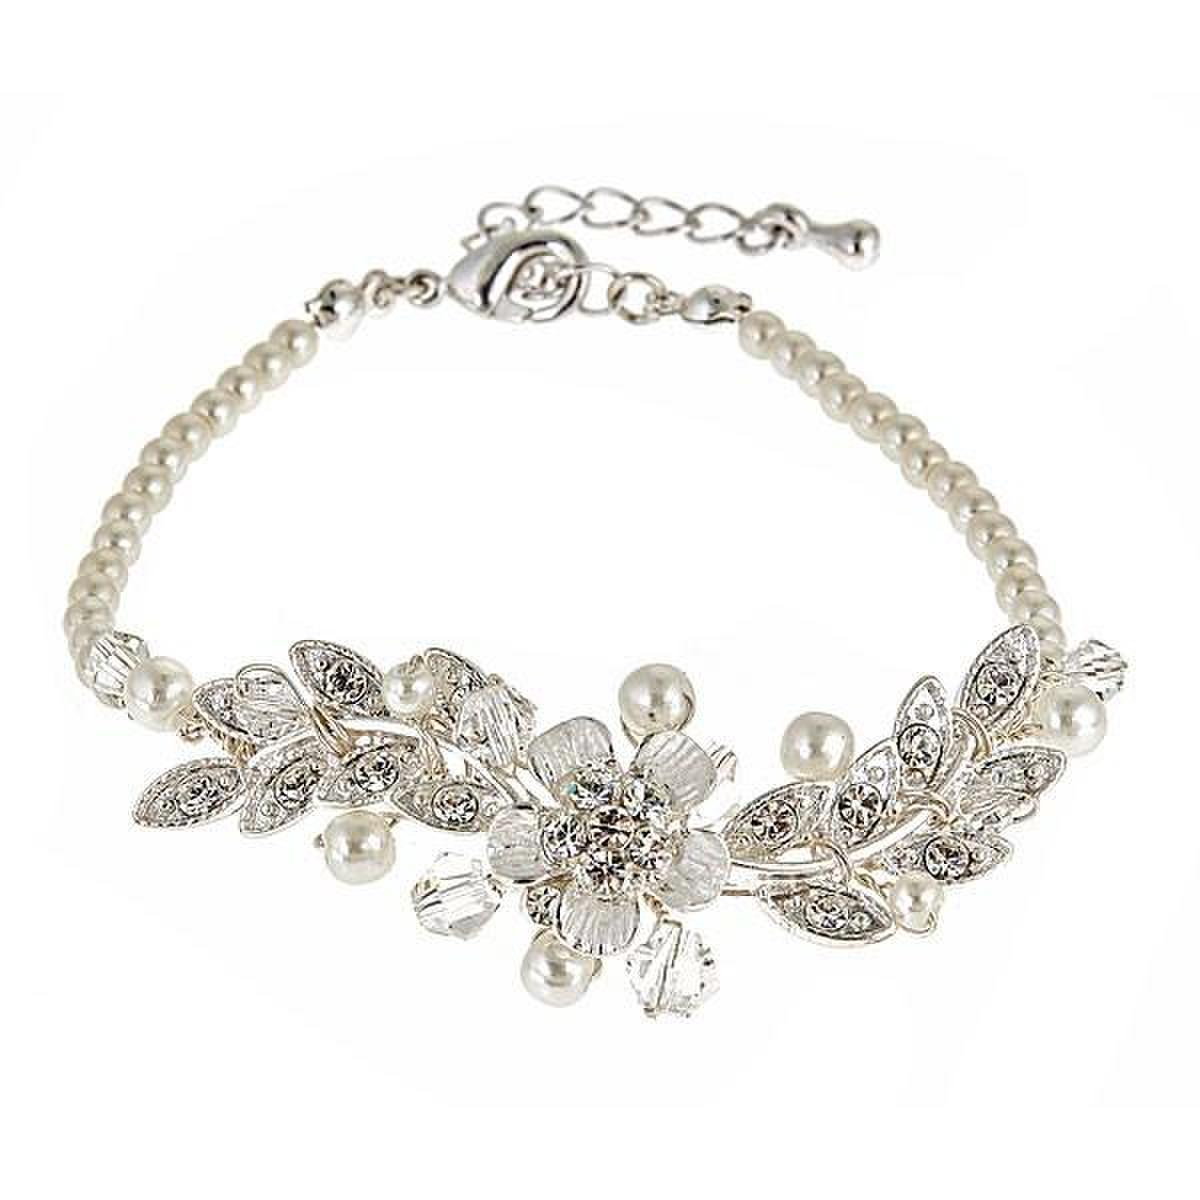 David Tutera Jewelry